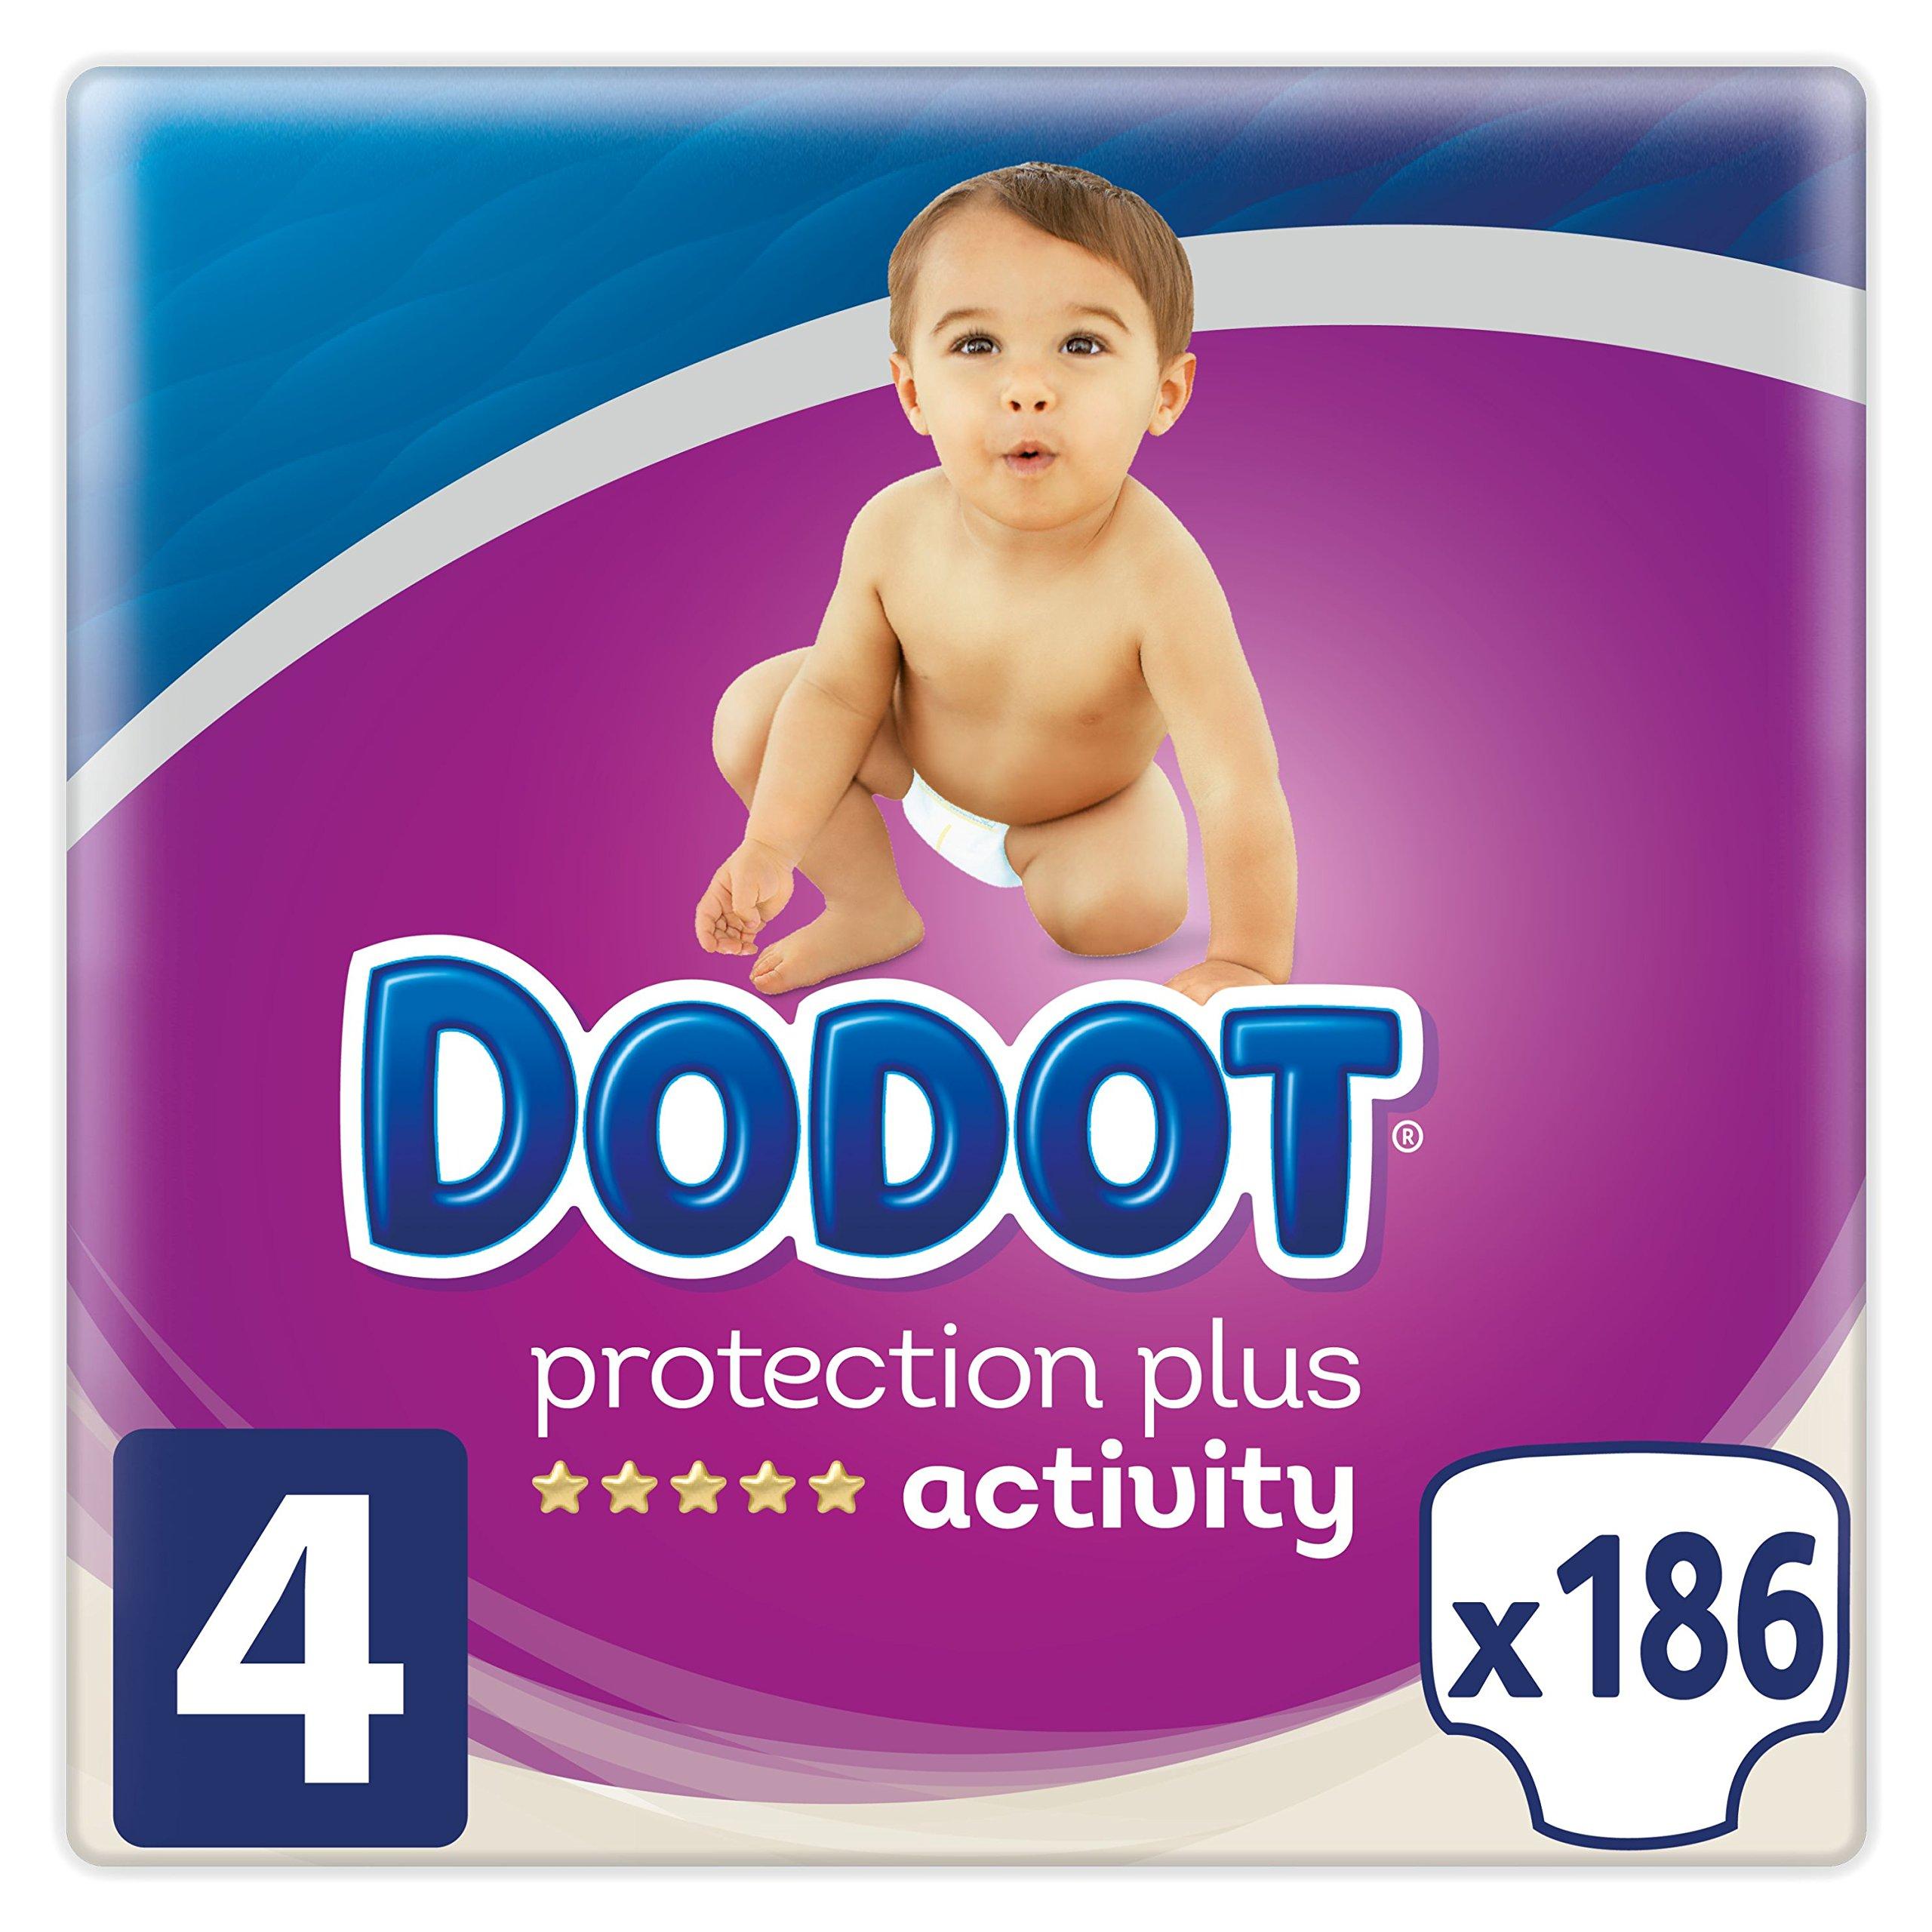 Dodot Protection Plus Activity - Pañales para bebé, Talla 4 (8-14 kg